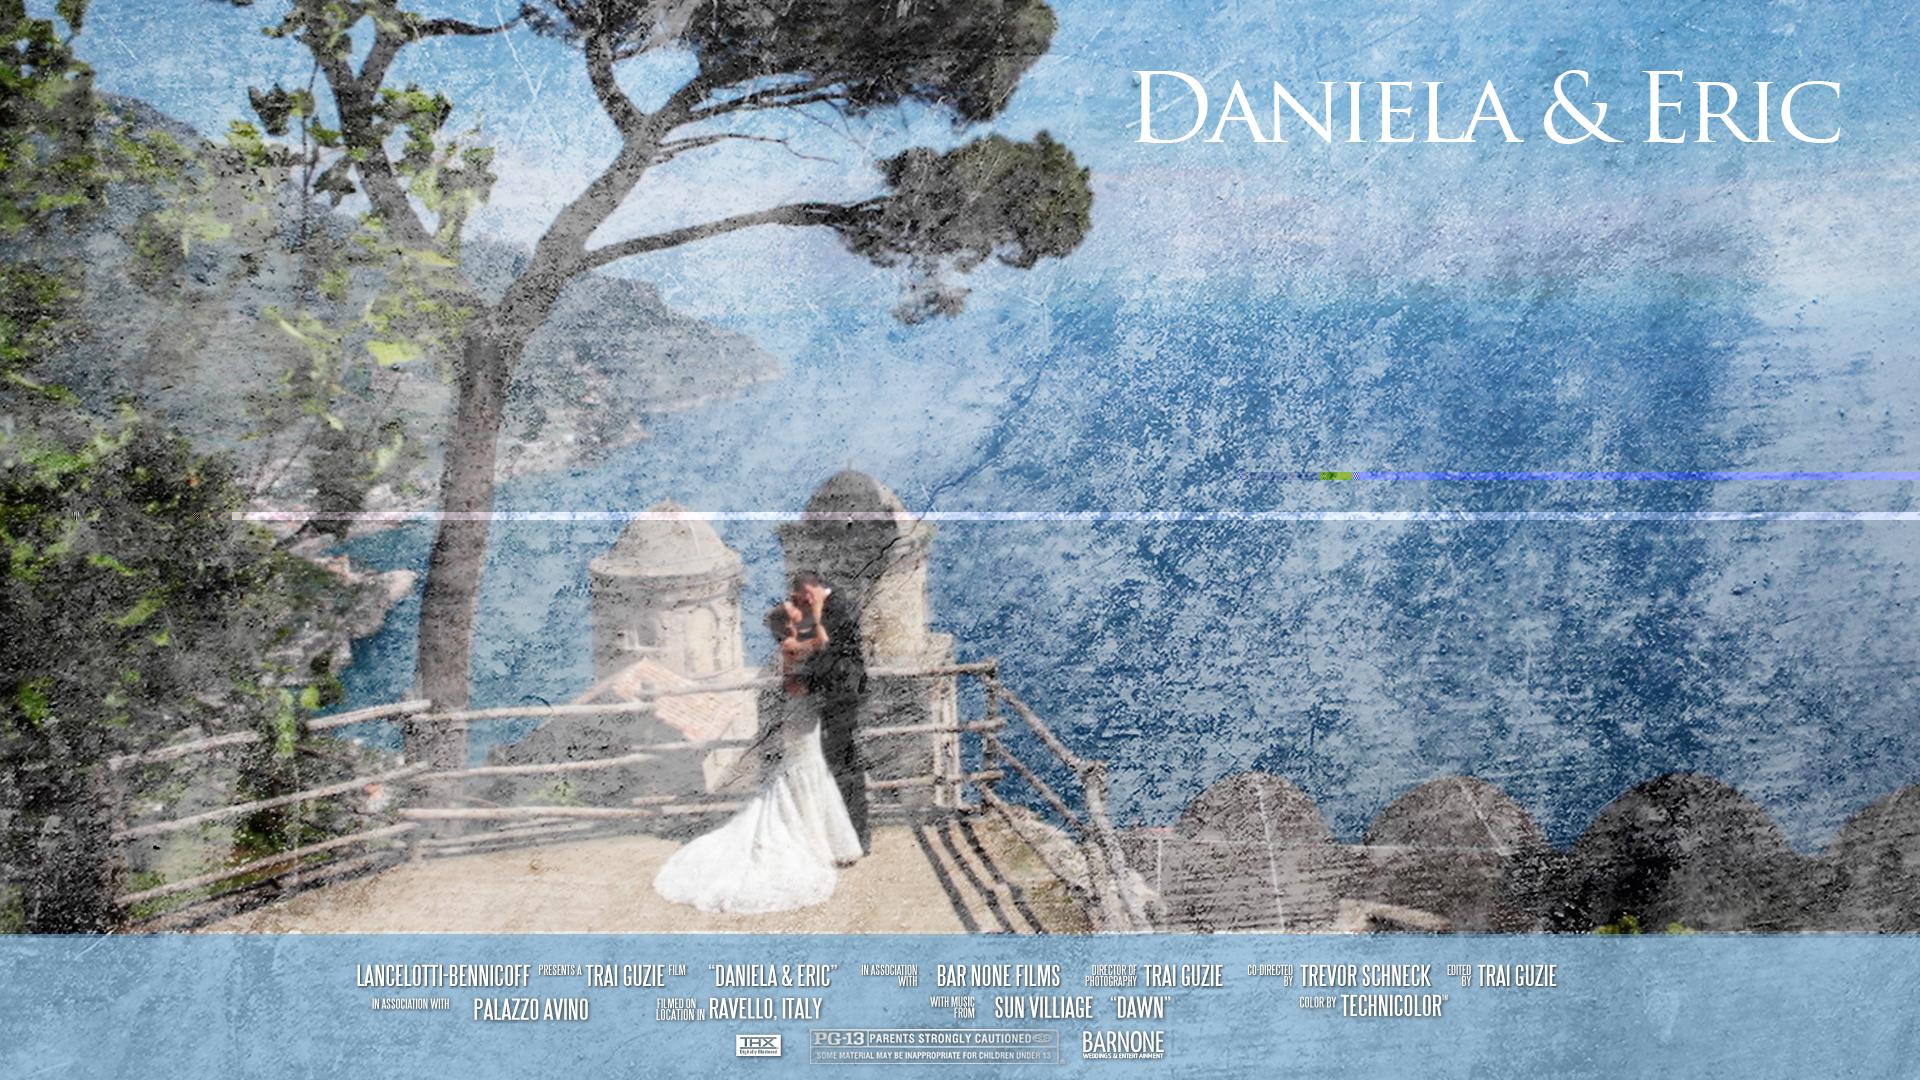 Movie Poster - Daniela & Eric